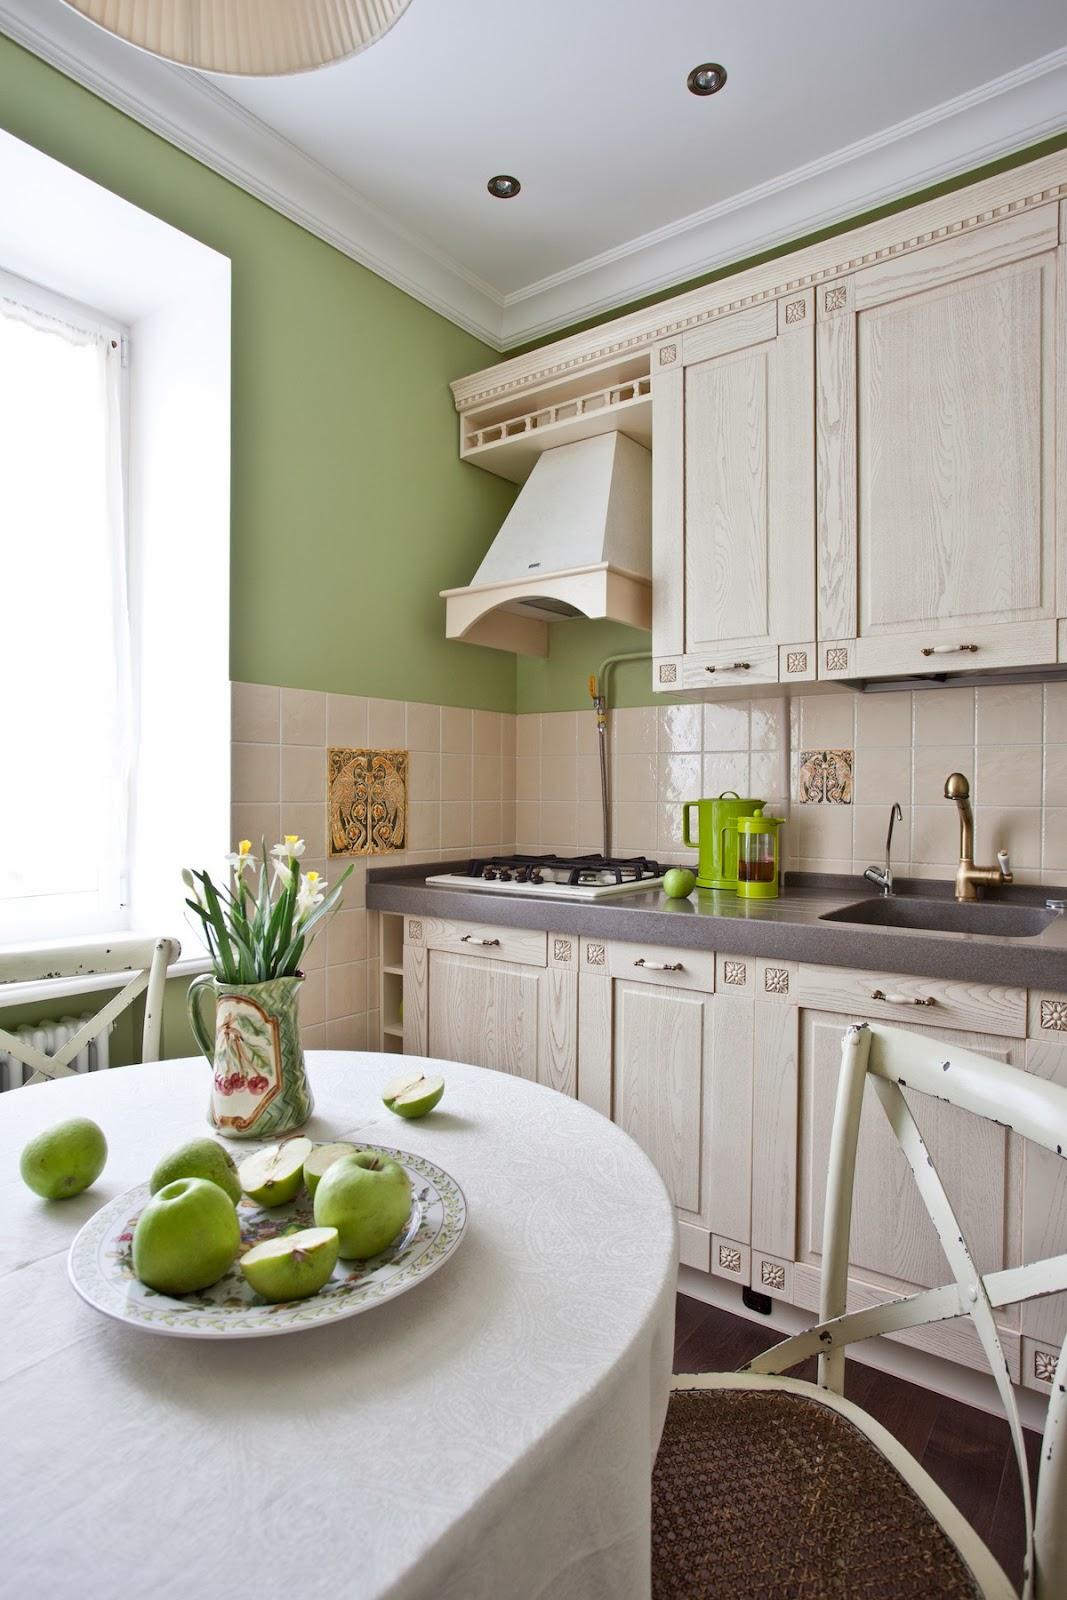 Уютная бежево-зеленая кухня в стиле шебби-шик